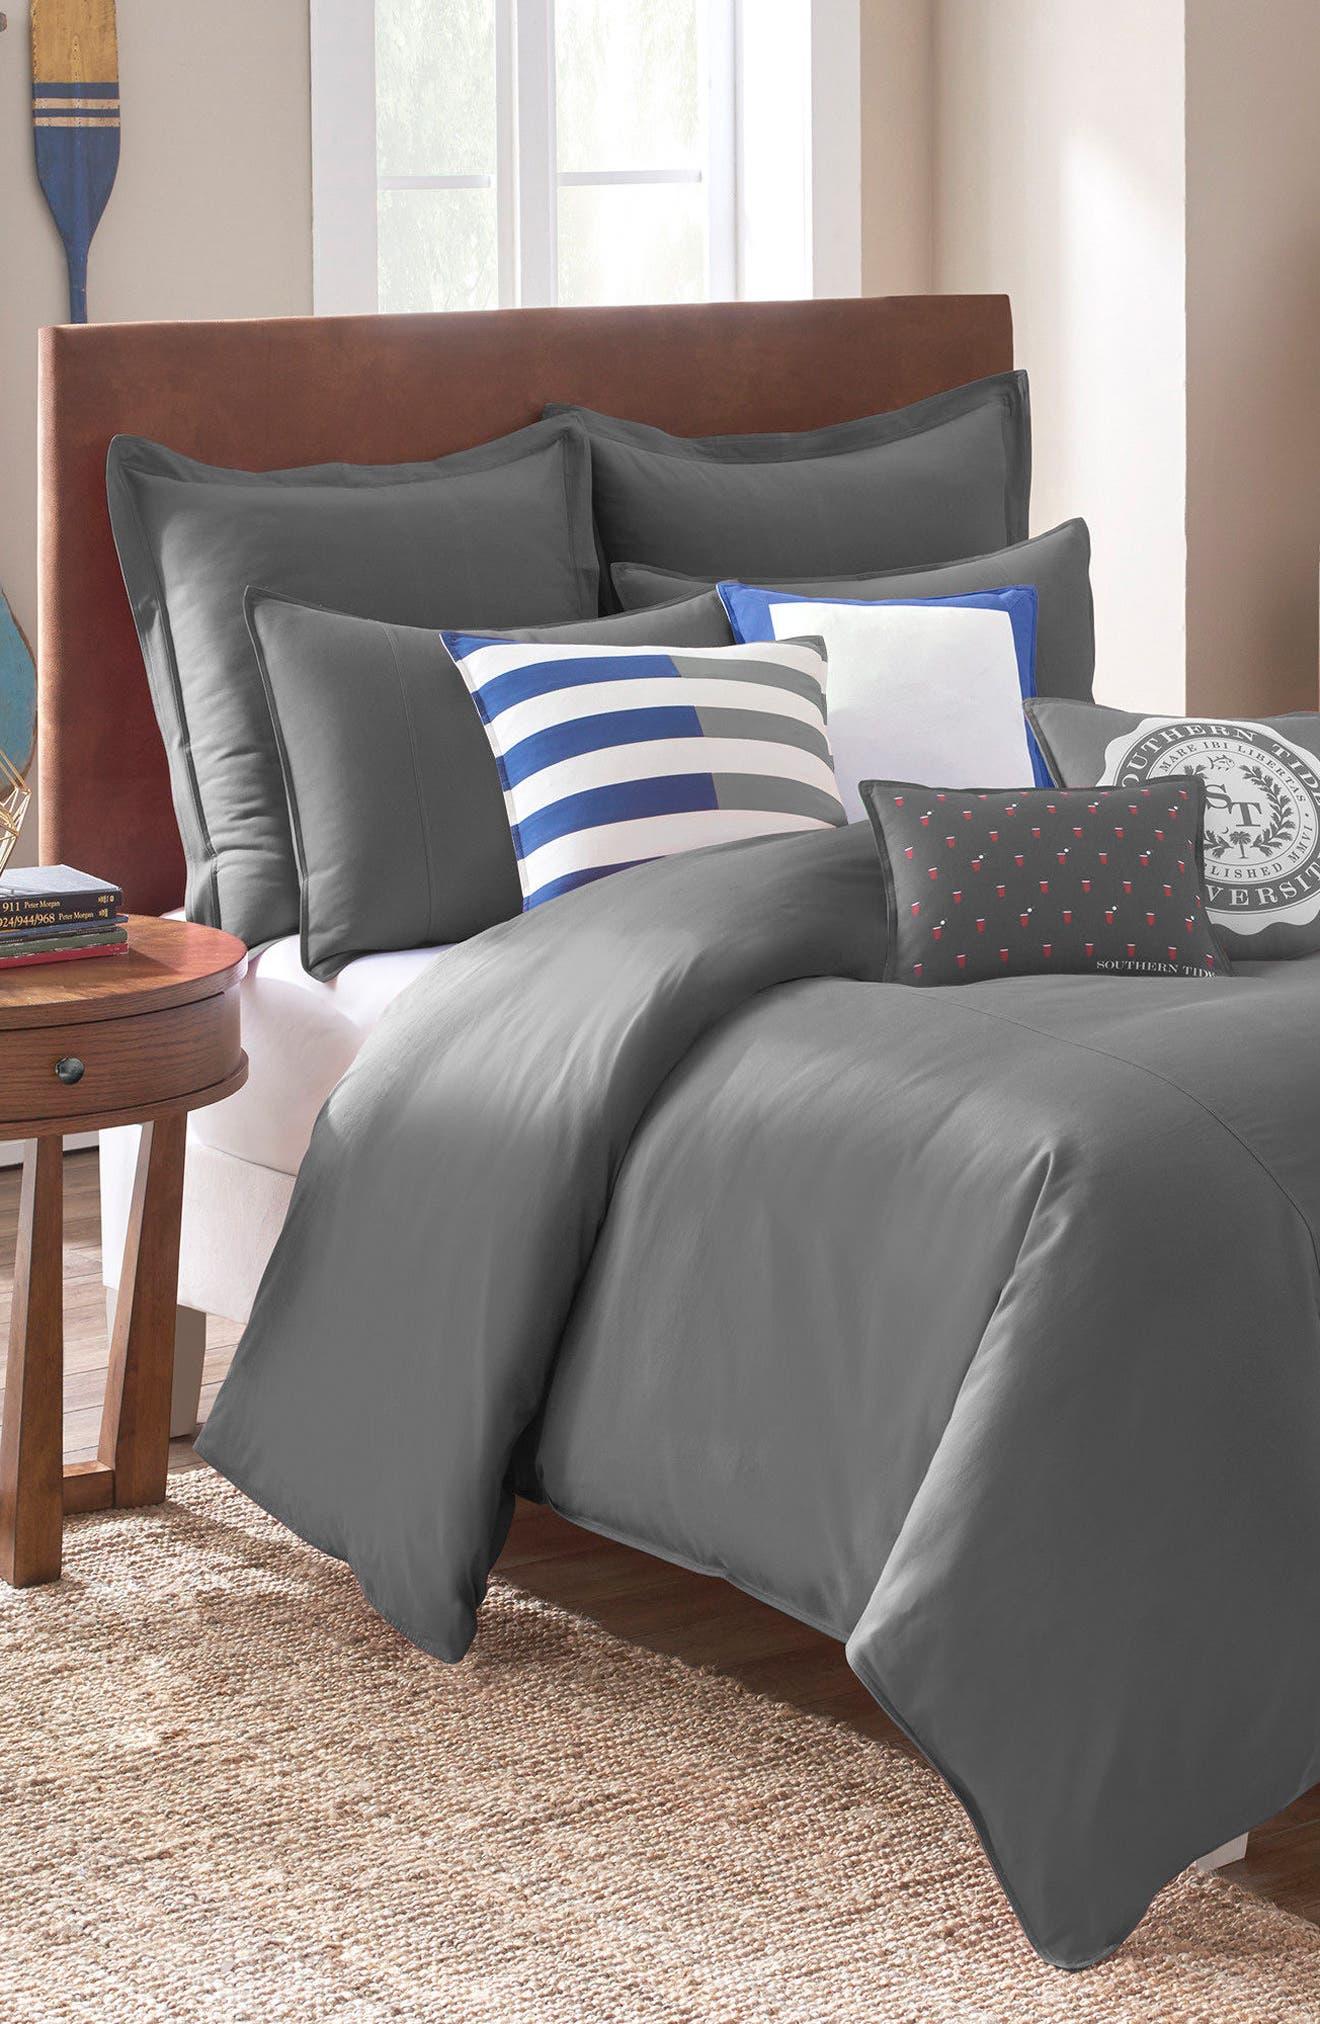 Skipjack Chino Comforter,                             Main thumbnail 1, color,                             020